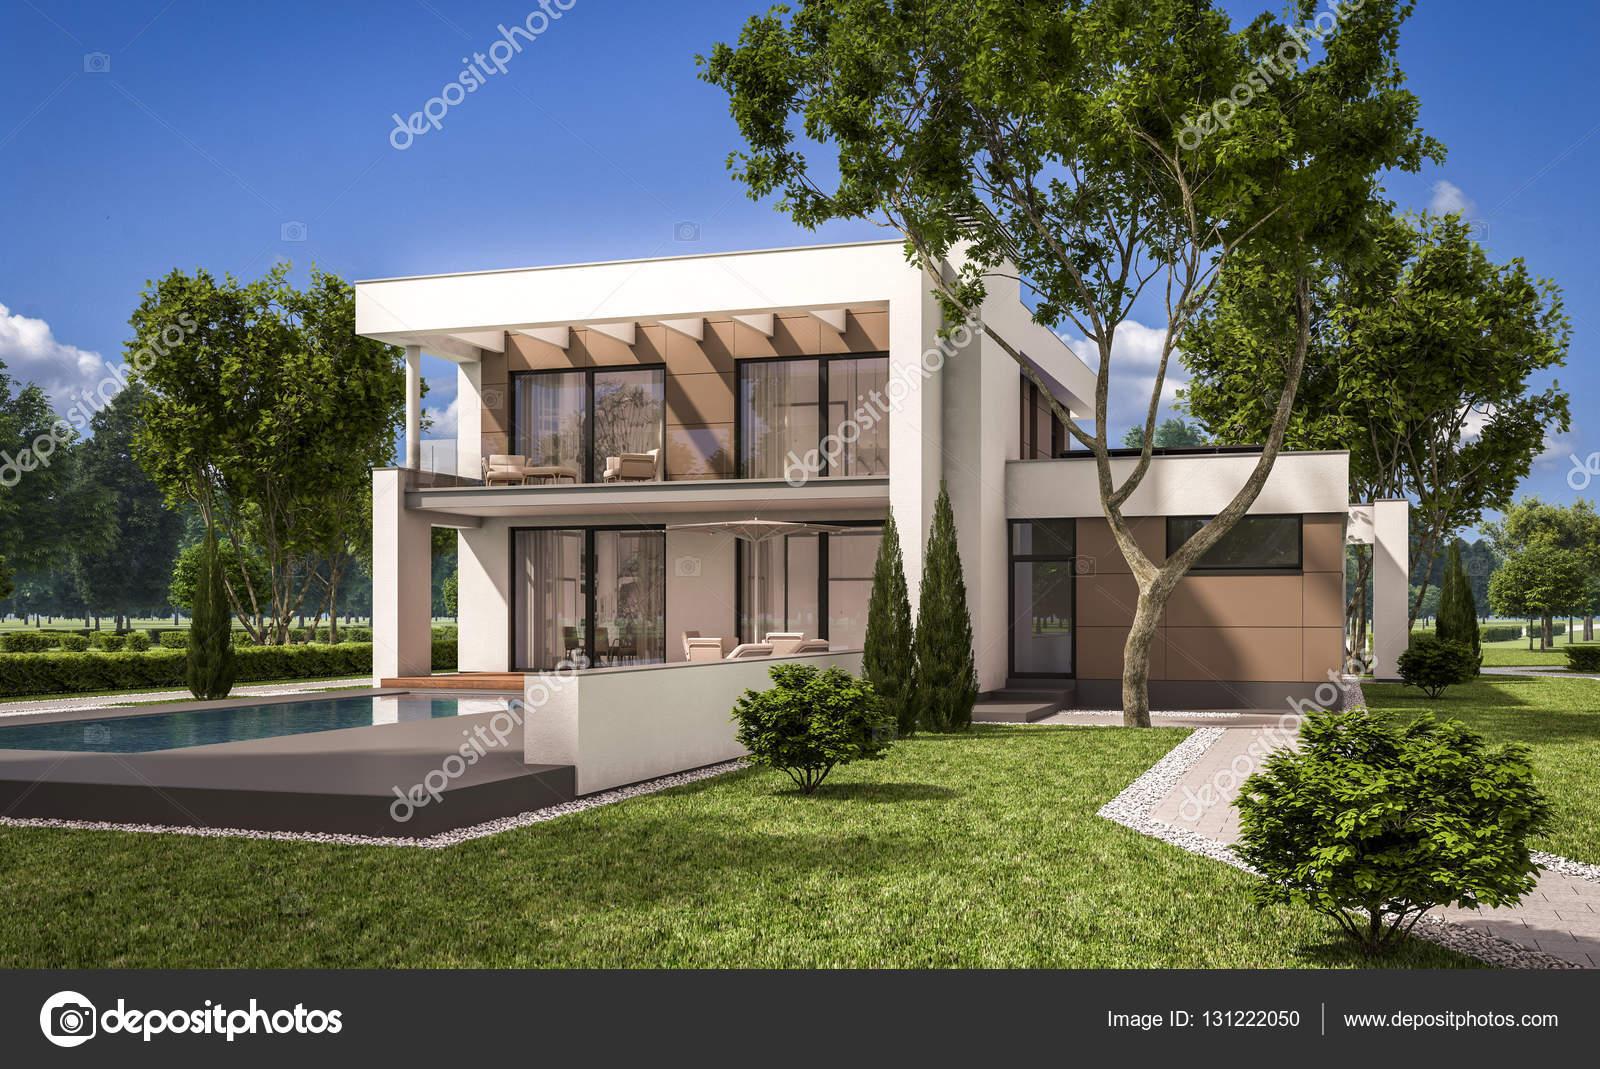 Render 3d de casa moderna foto de stock korisbo gmail for Casas modernas renders